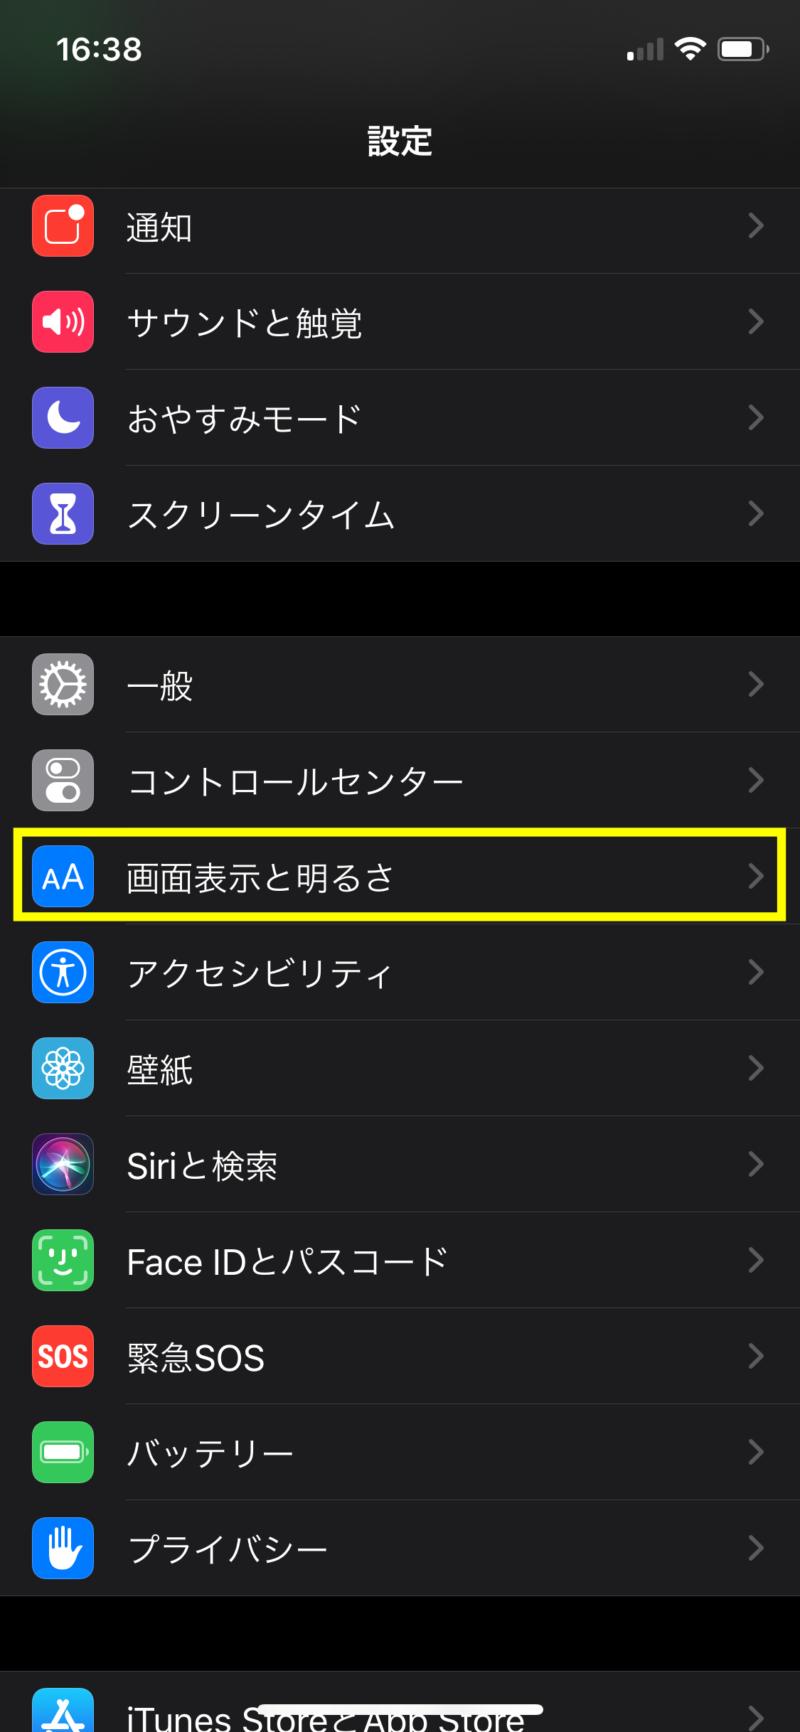 「iPhone 11」「iPhone 11 Pro」 「iPhone 11 Pro Max」の画面が消える(自動ロック)までの時間を変更する方法